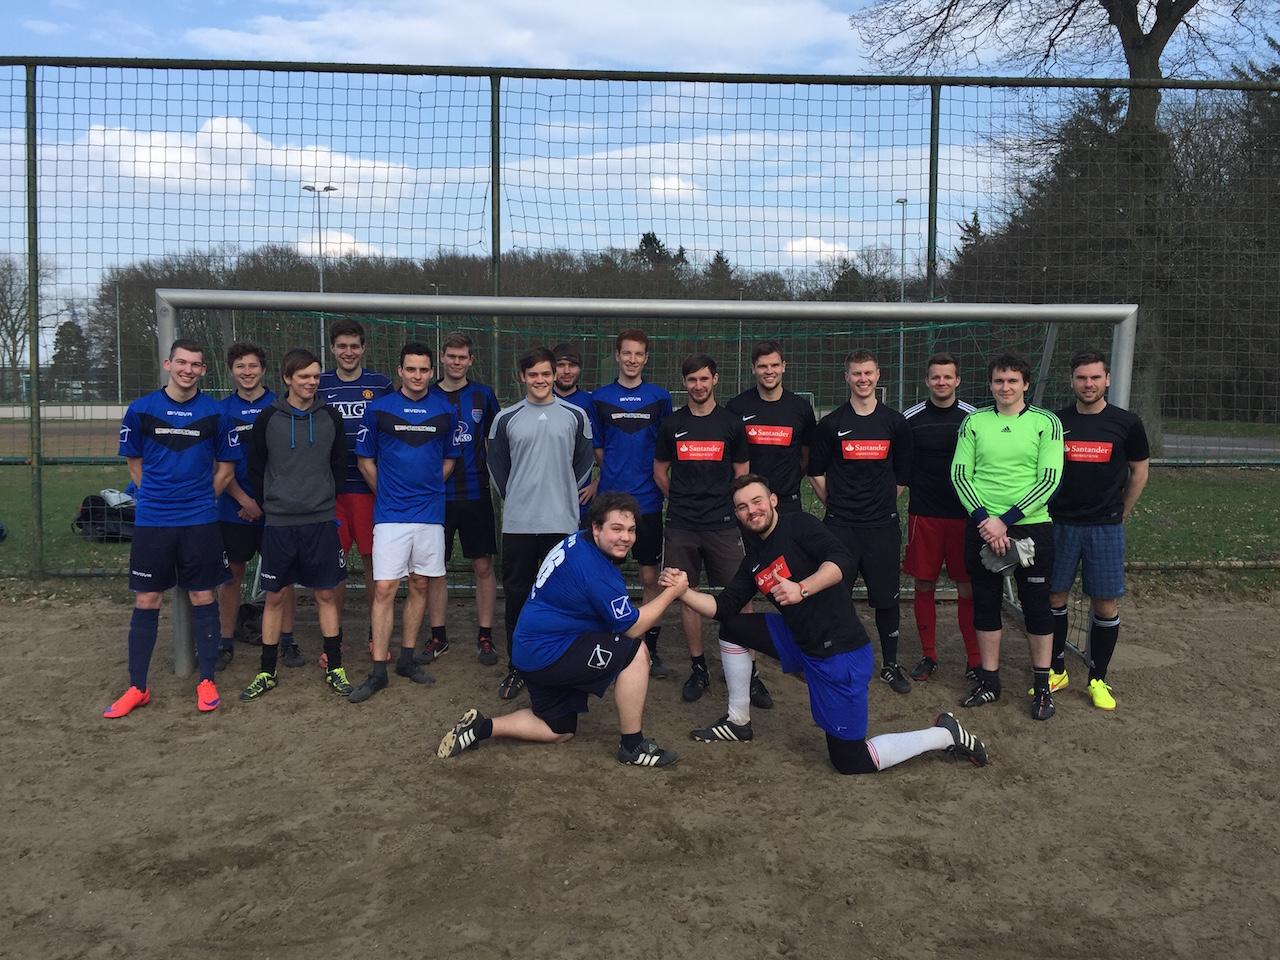 DFB vs Fifagötter